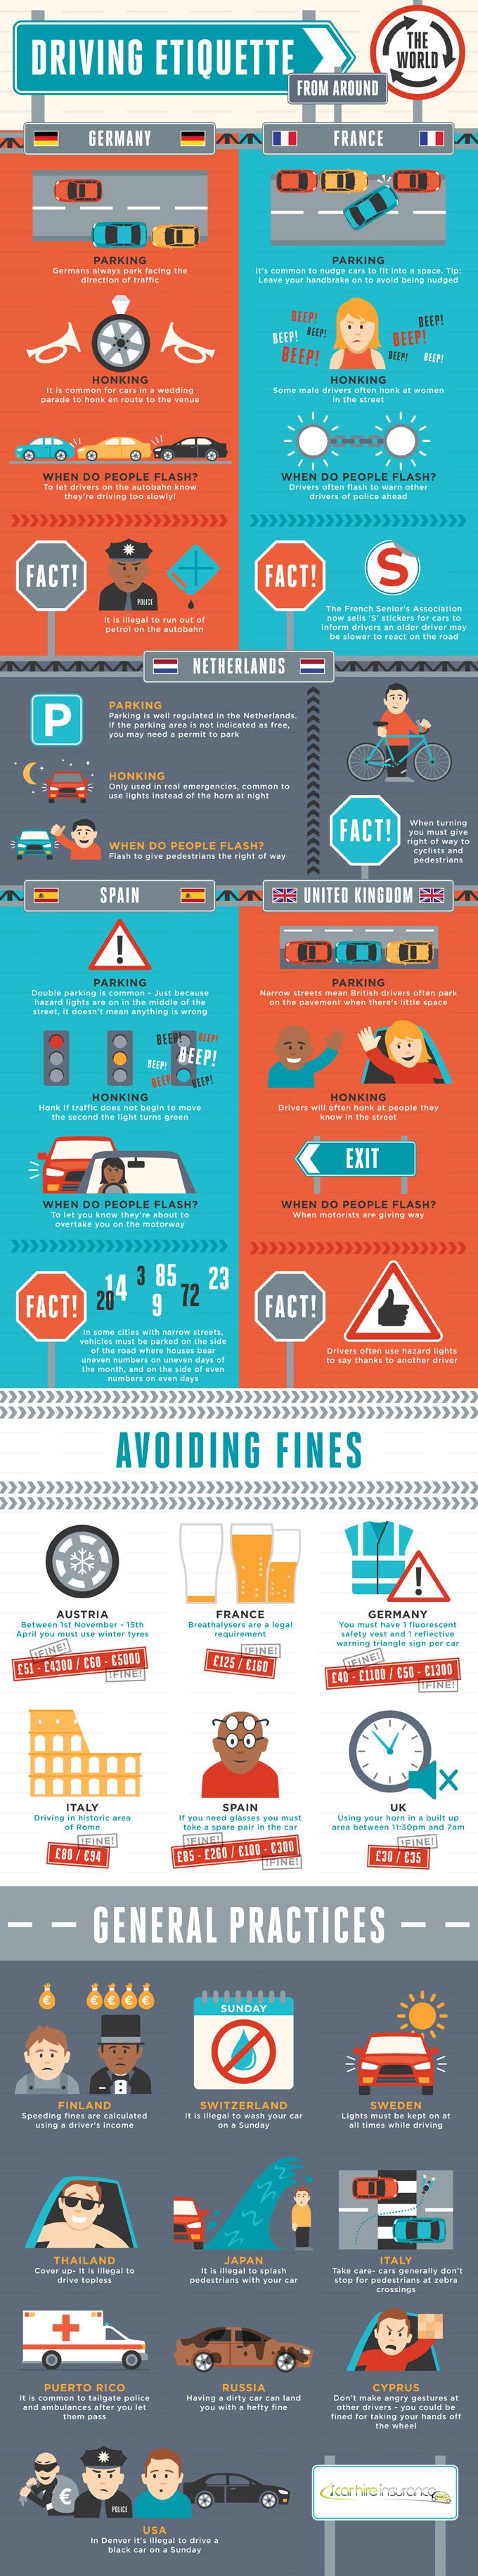 Driving Etiquette Around The World